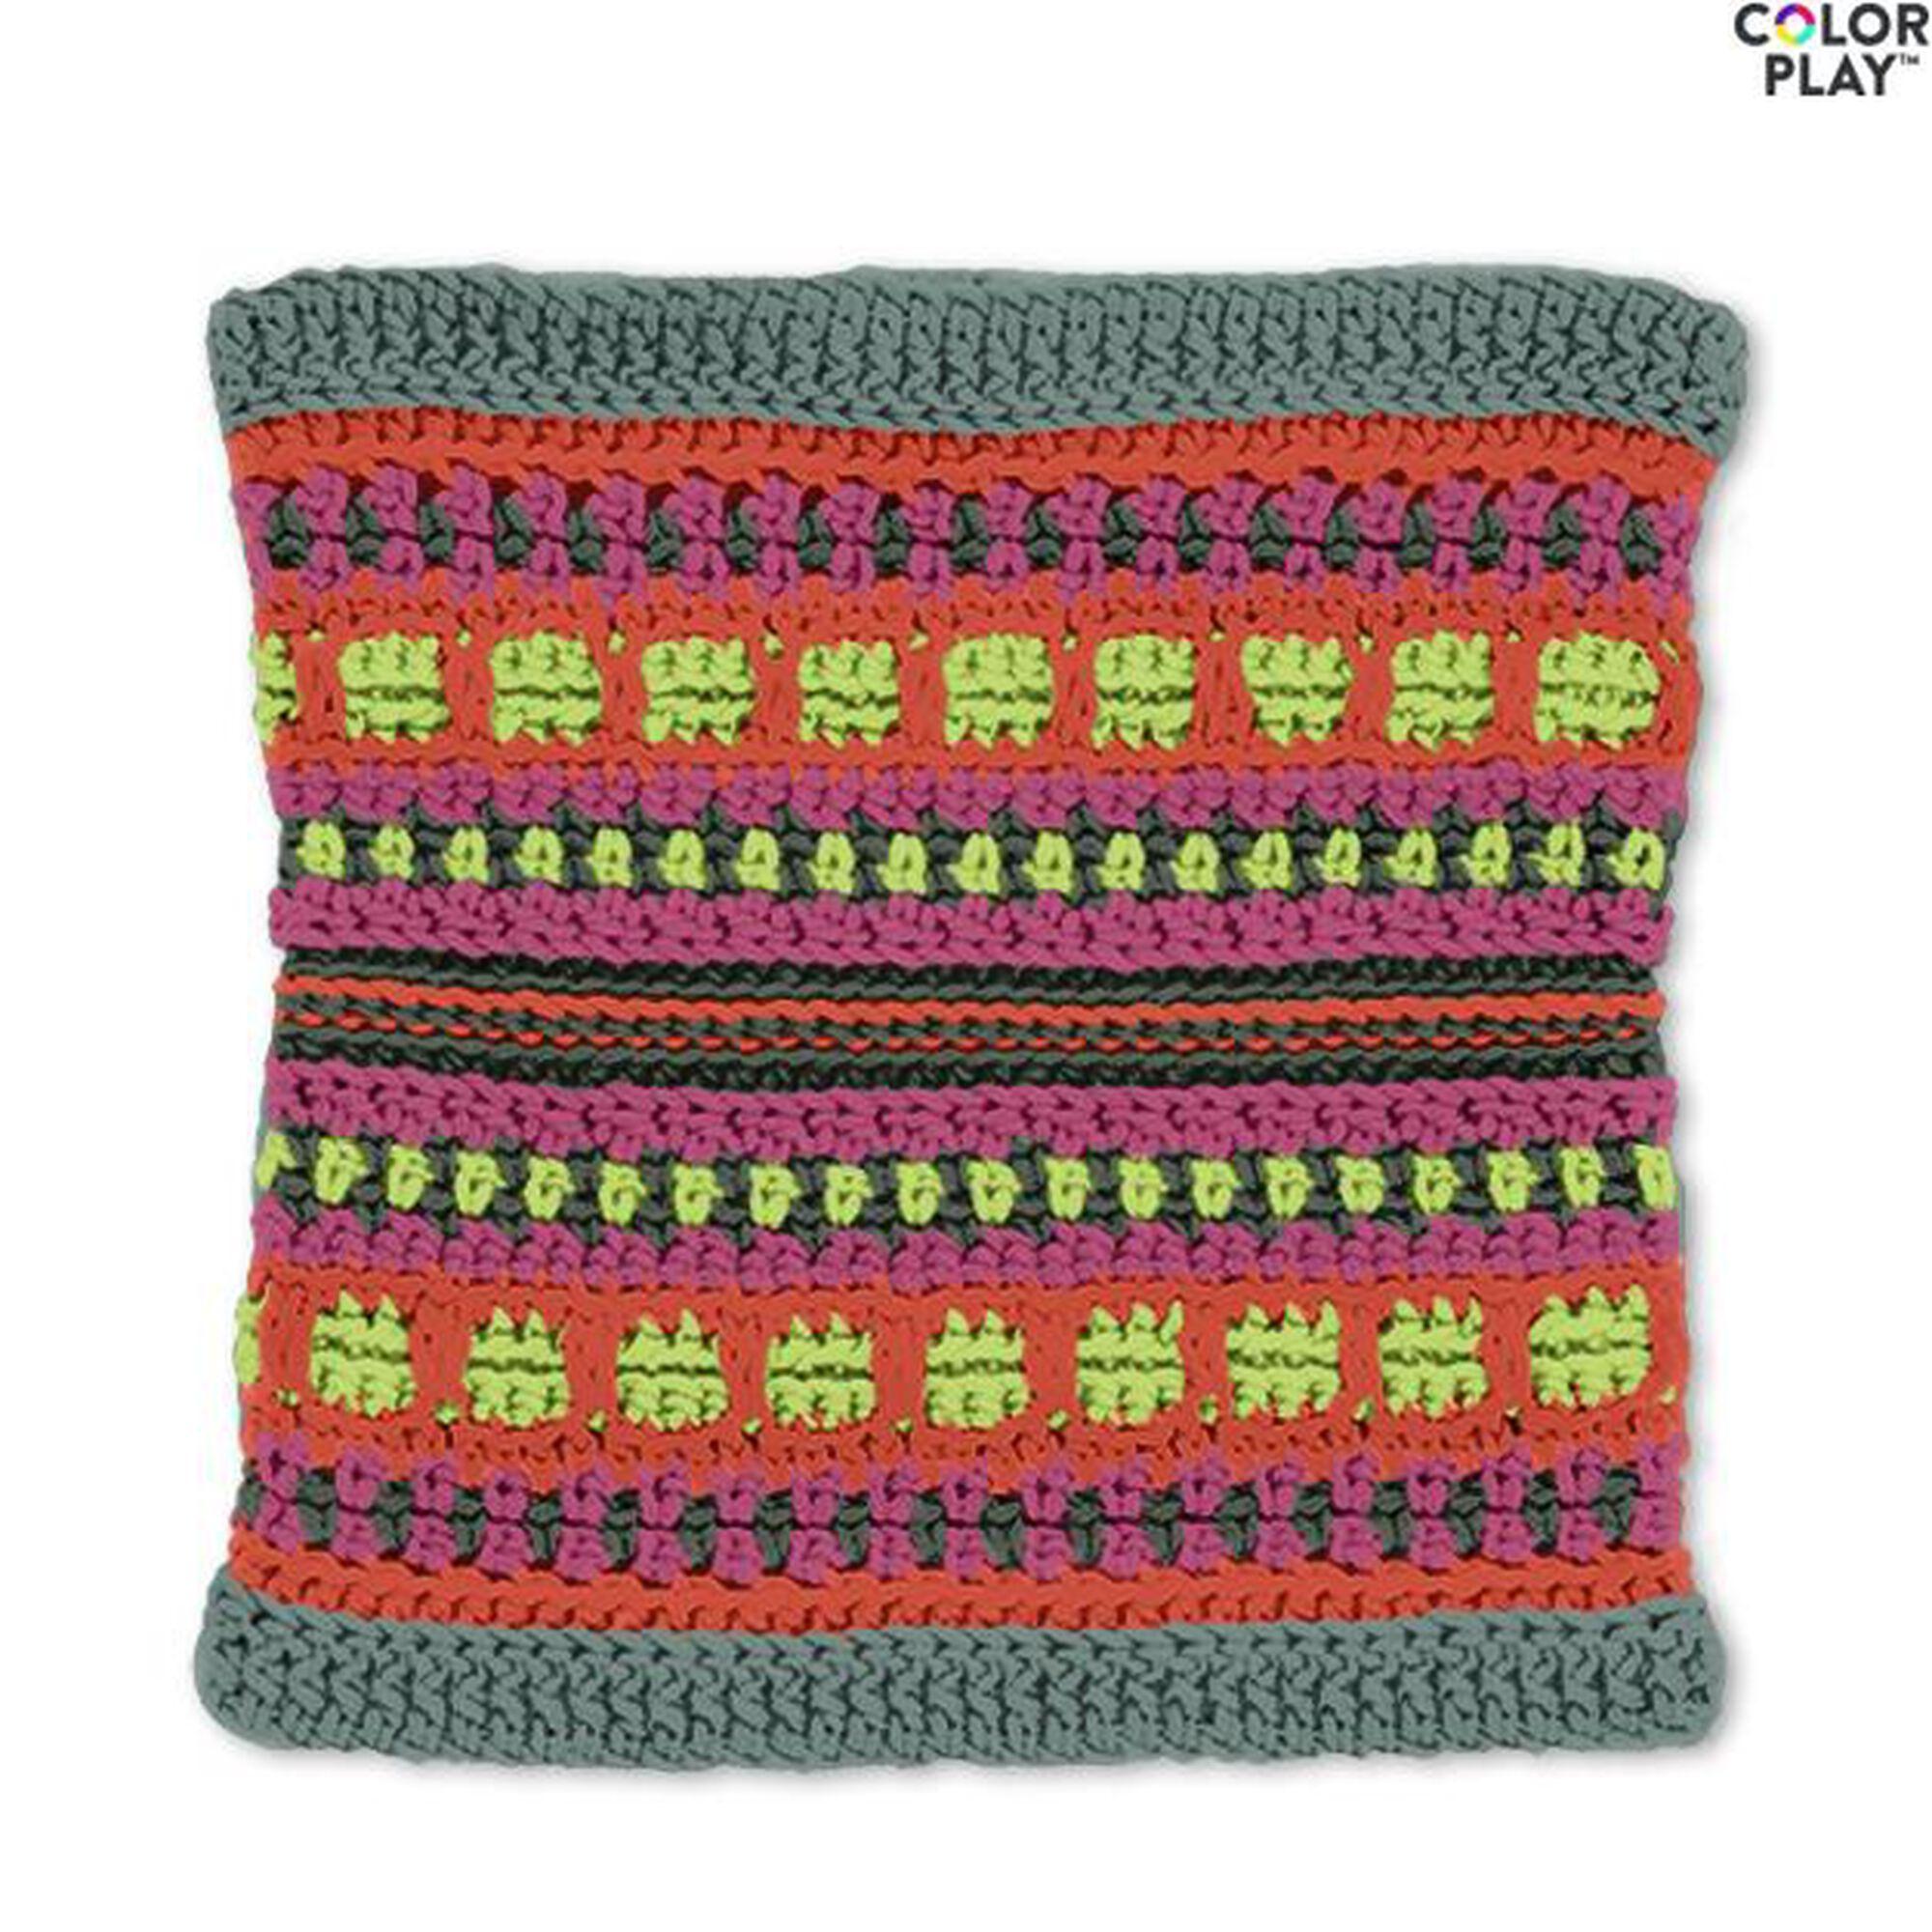 Caron X Pantone Color Block Crochet Cowl Free Pattern Yarnspirations